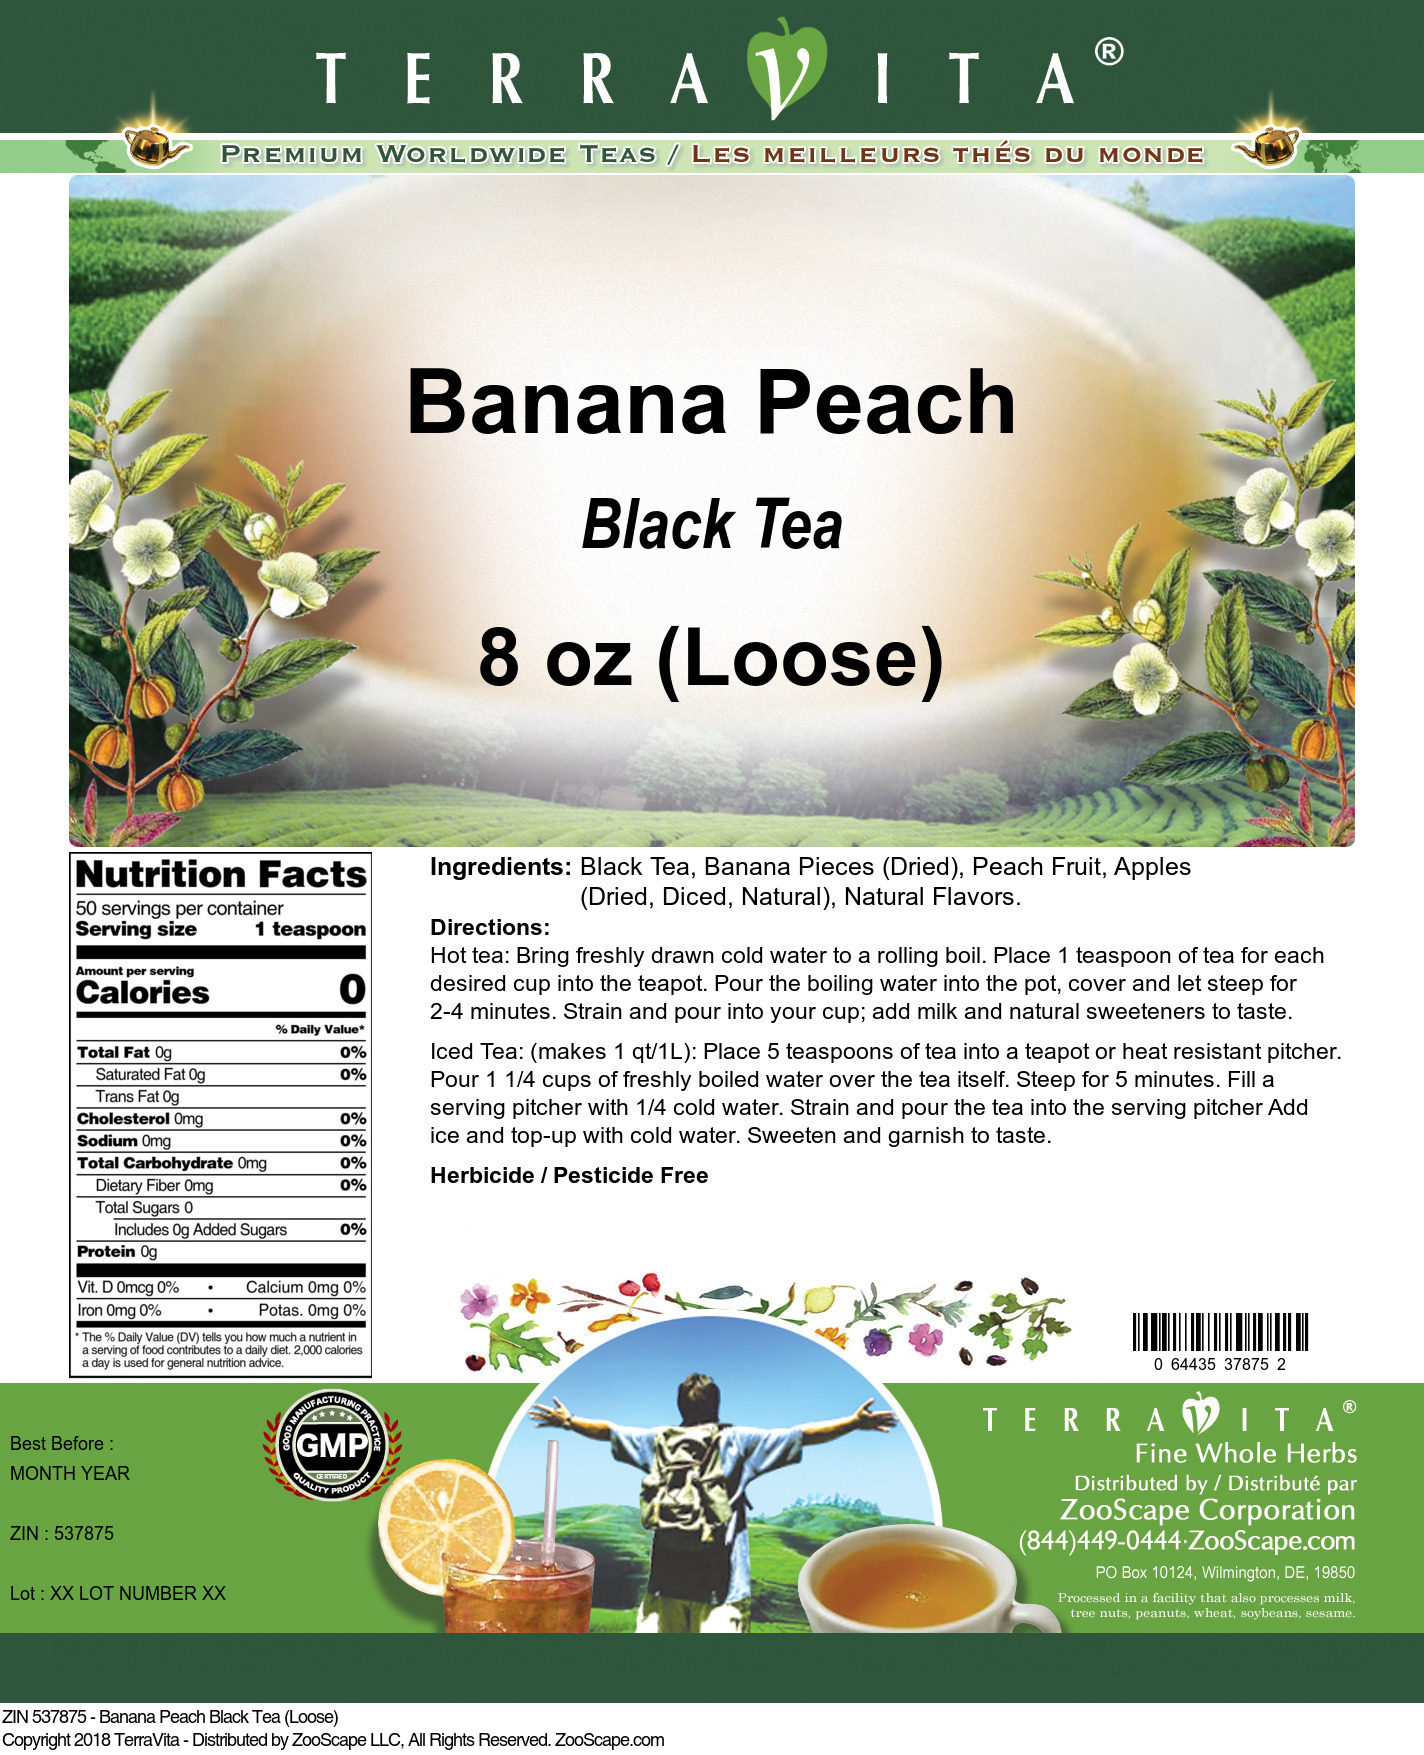 Banana Peach Black Tea (Loose)